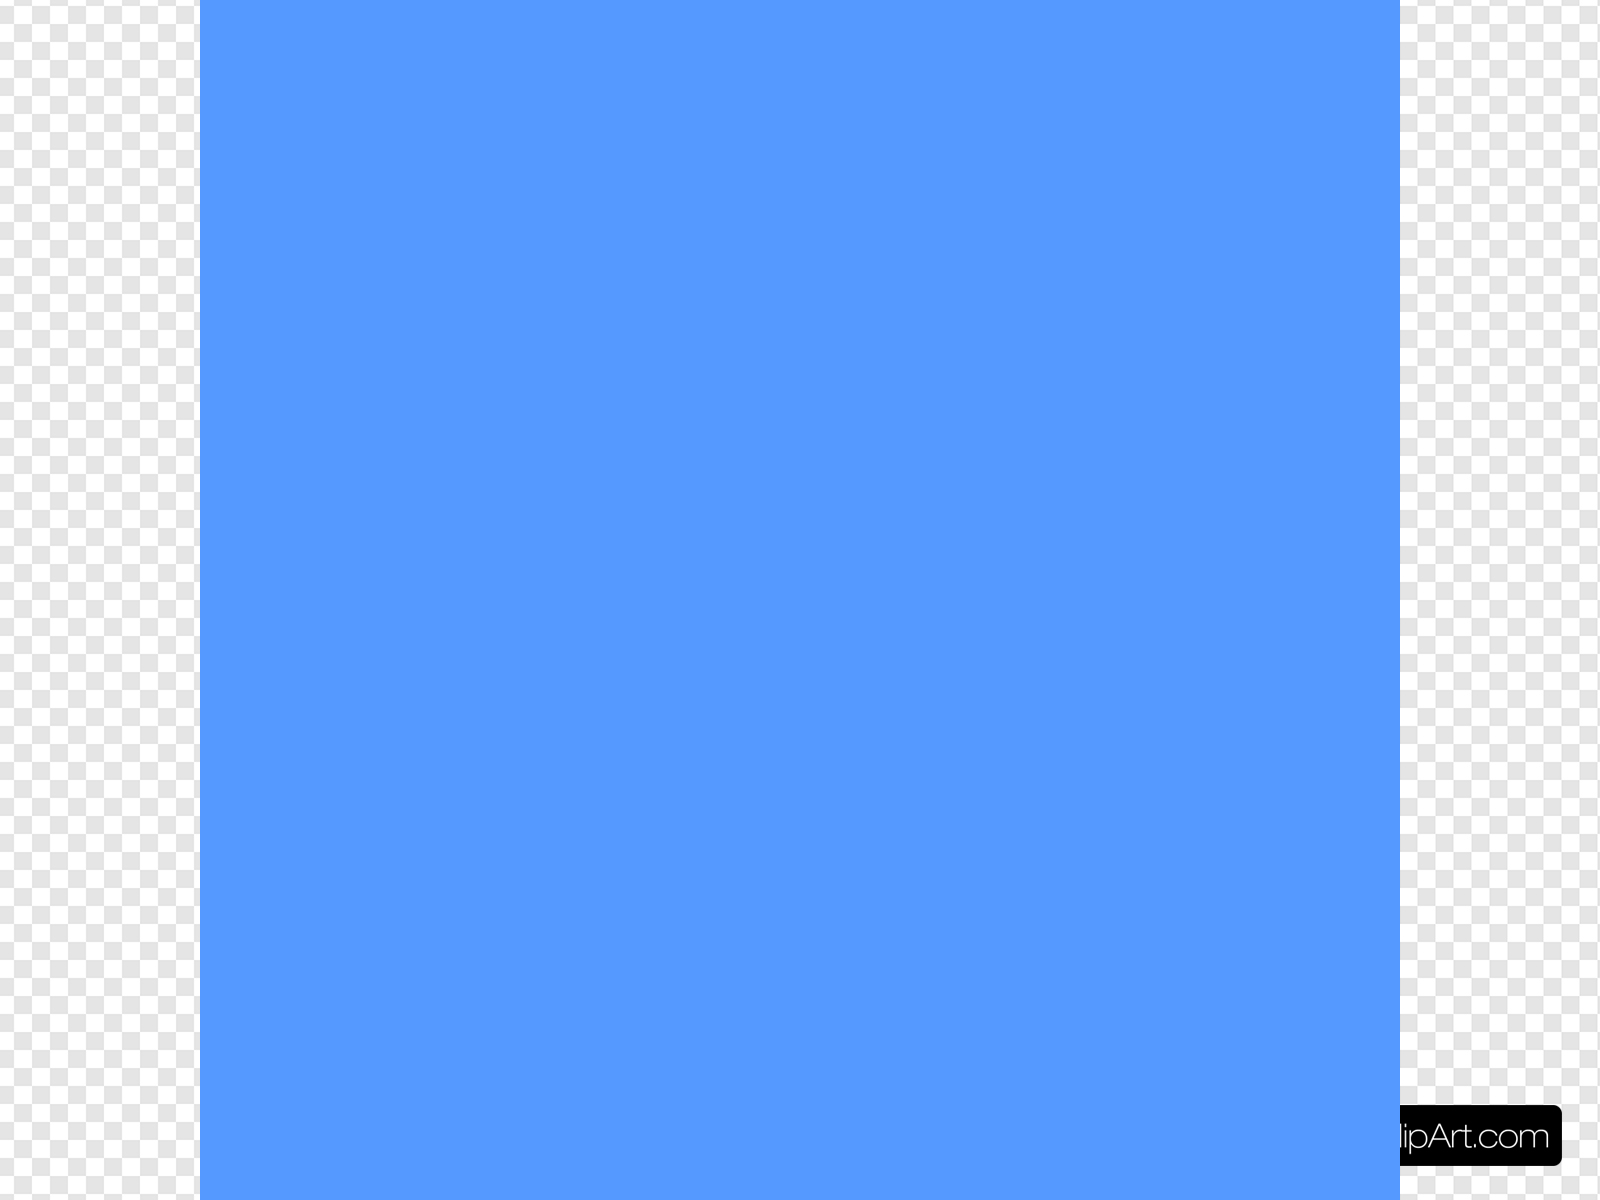 Blue square clipart clip art black and white stock Light Blue Square Clip art, Icon and SVG - SVG Clipart clip art black and white stock